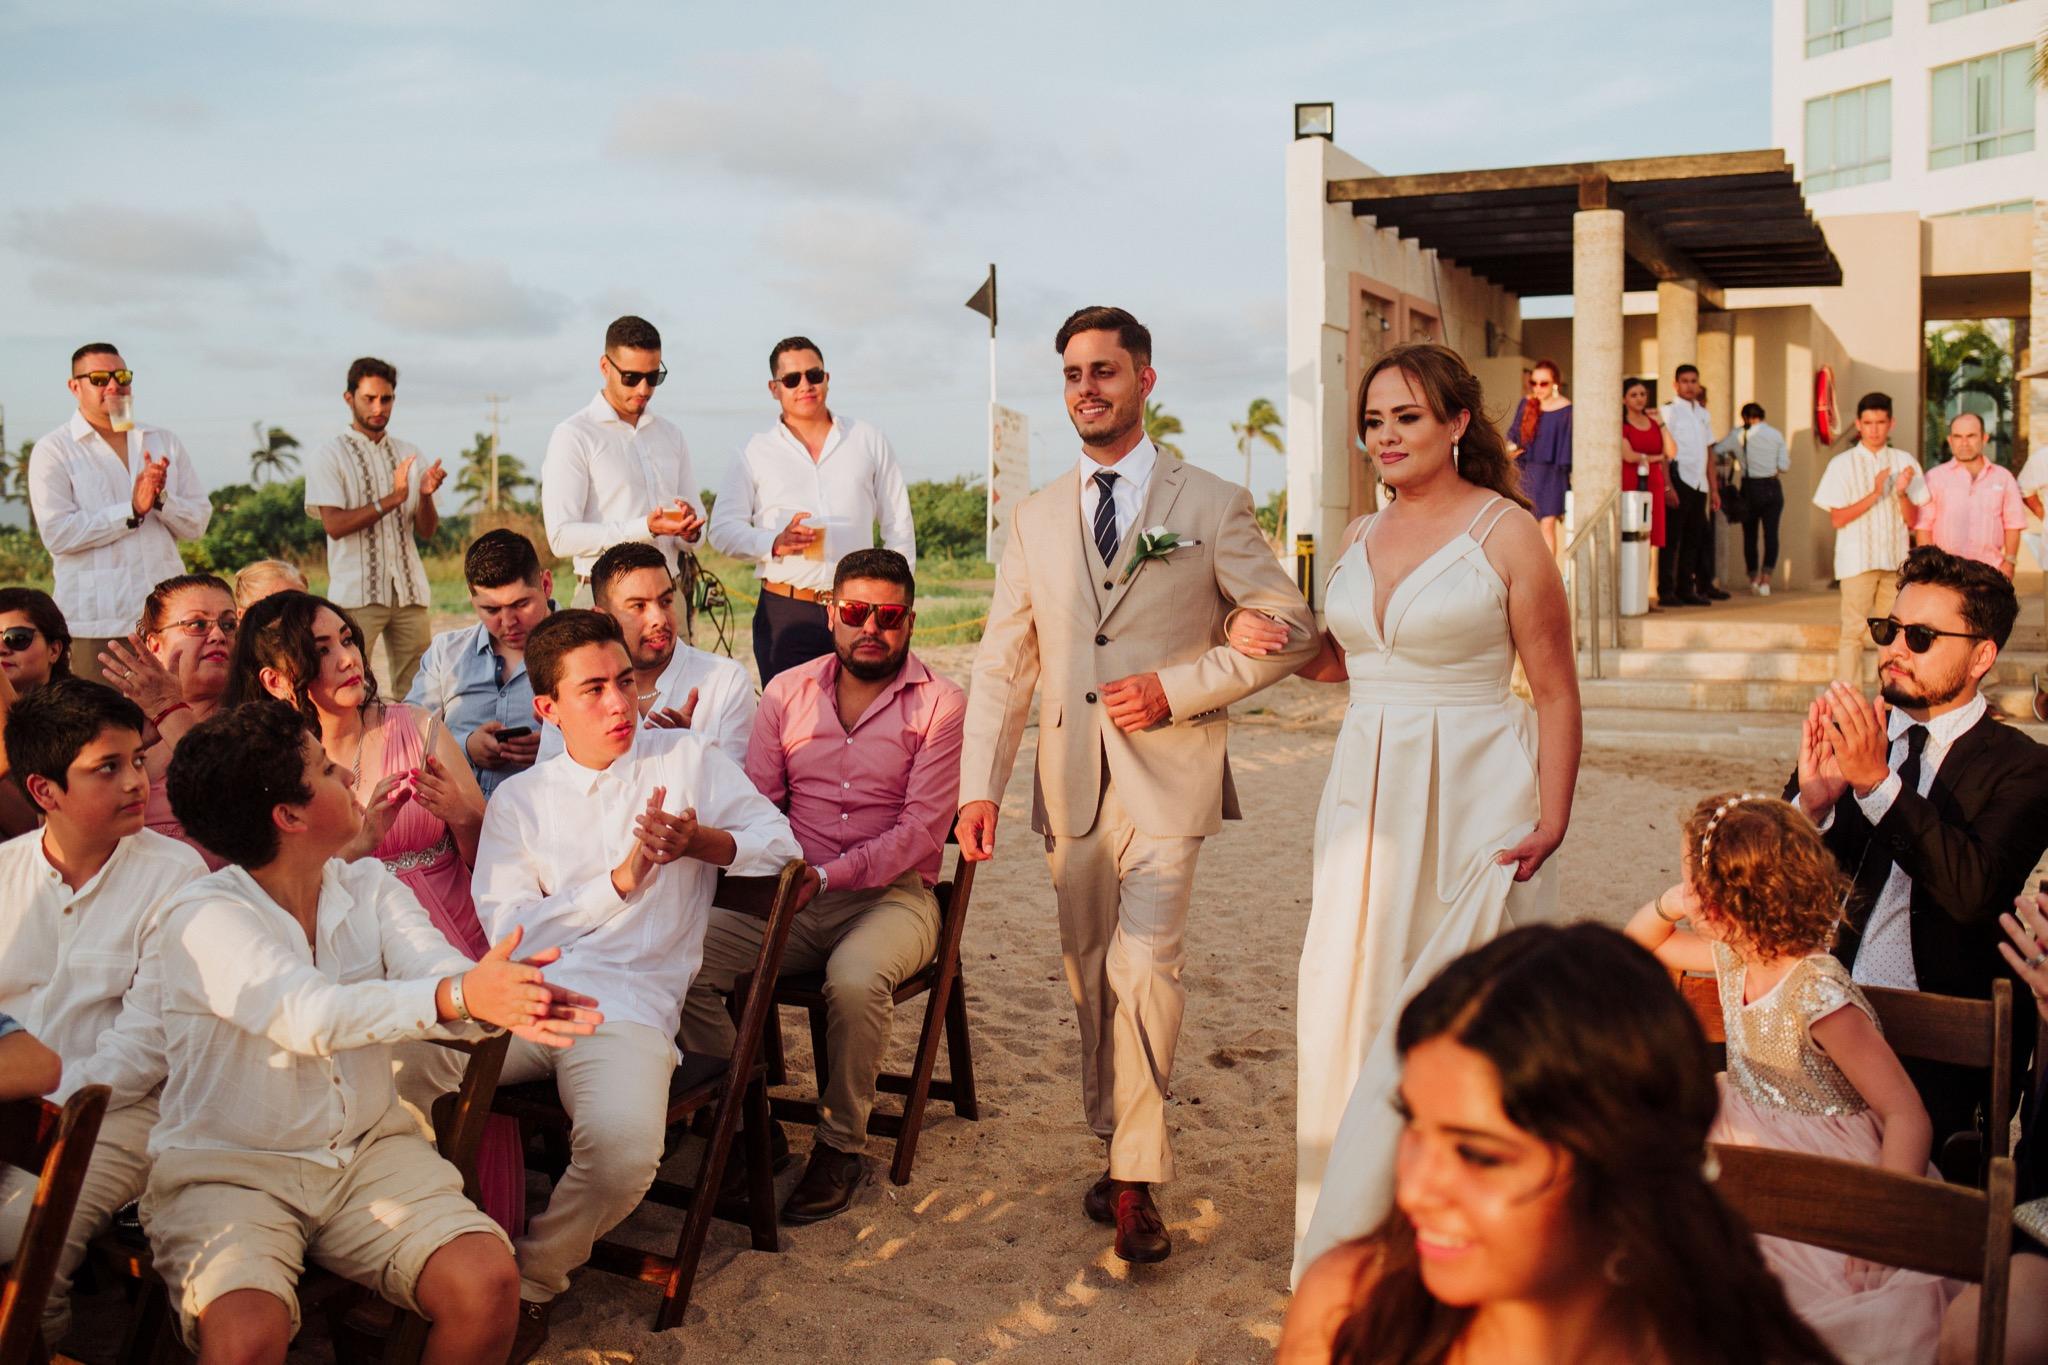 Javier_noriega_fotografo_bodas_profesional_zacatecas_mexico_mazatlan_sinaloa_photographer_weddings53